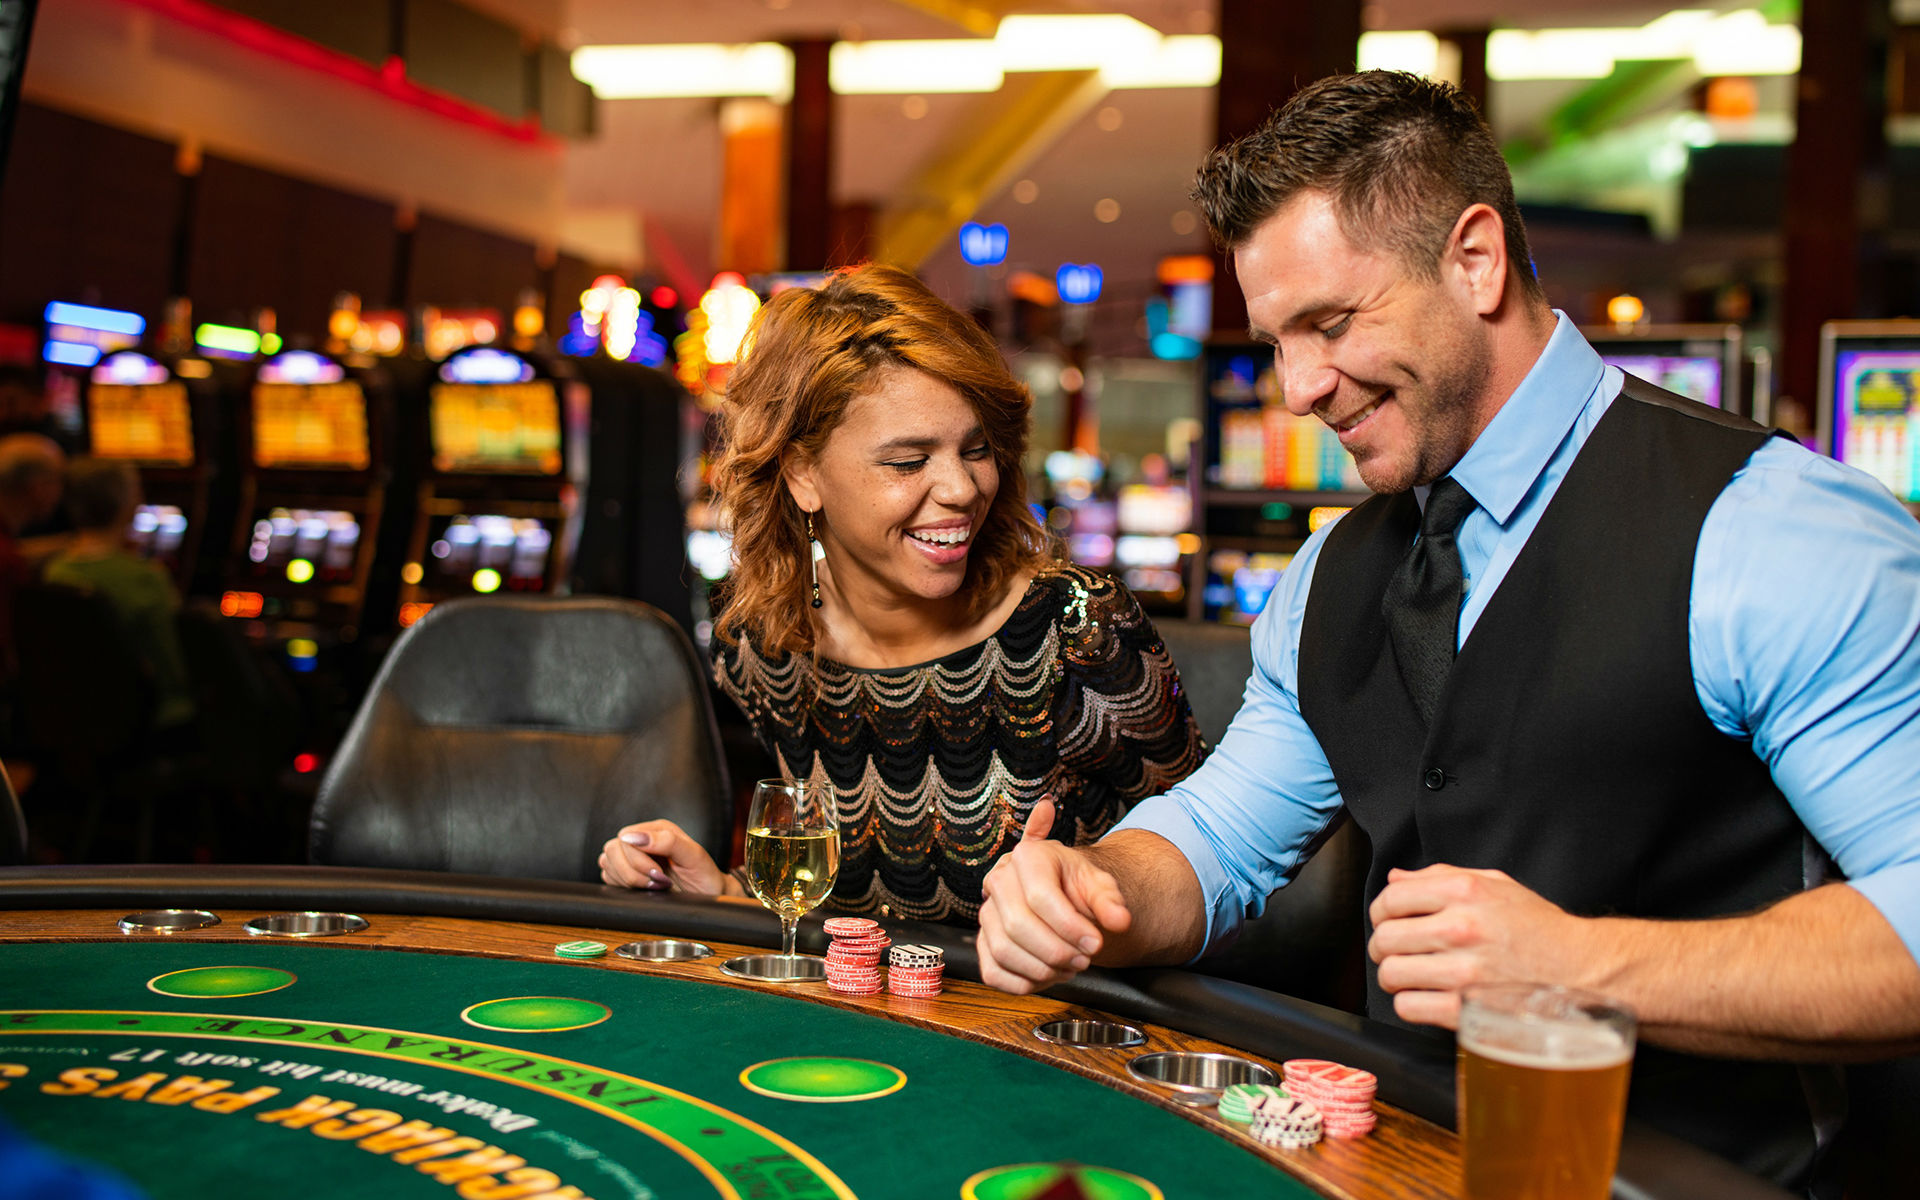 Northern Michigan Casino | Turtle Creek Casino and Hotel